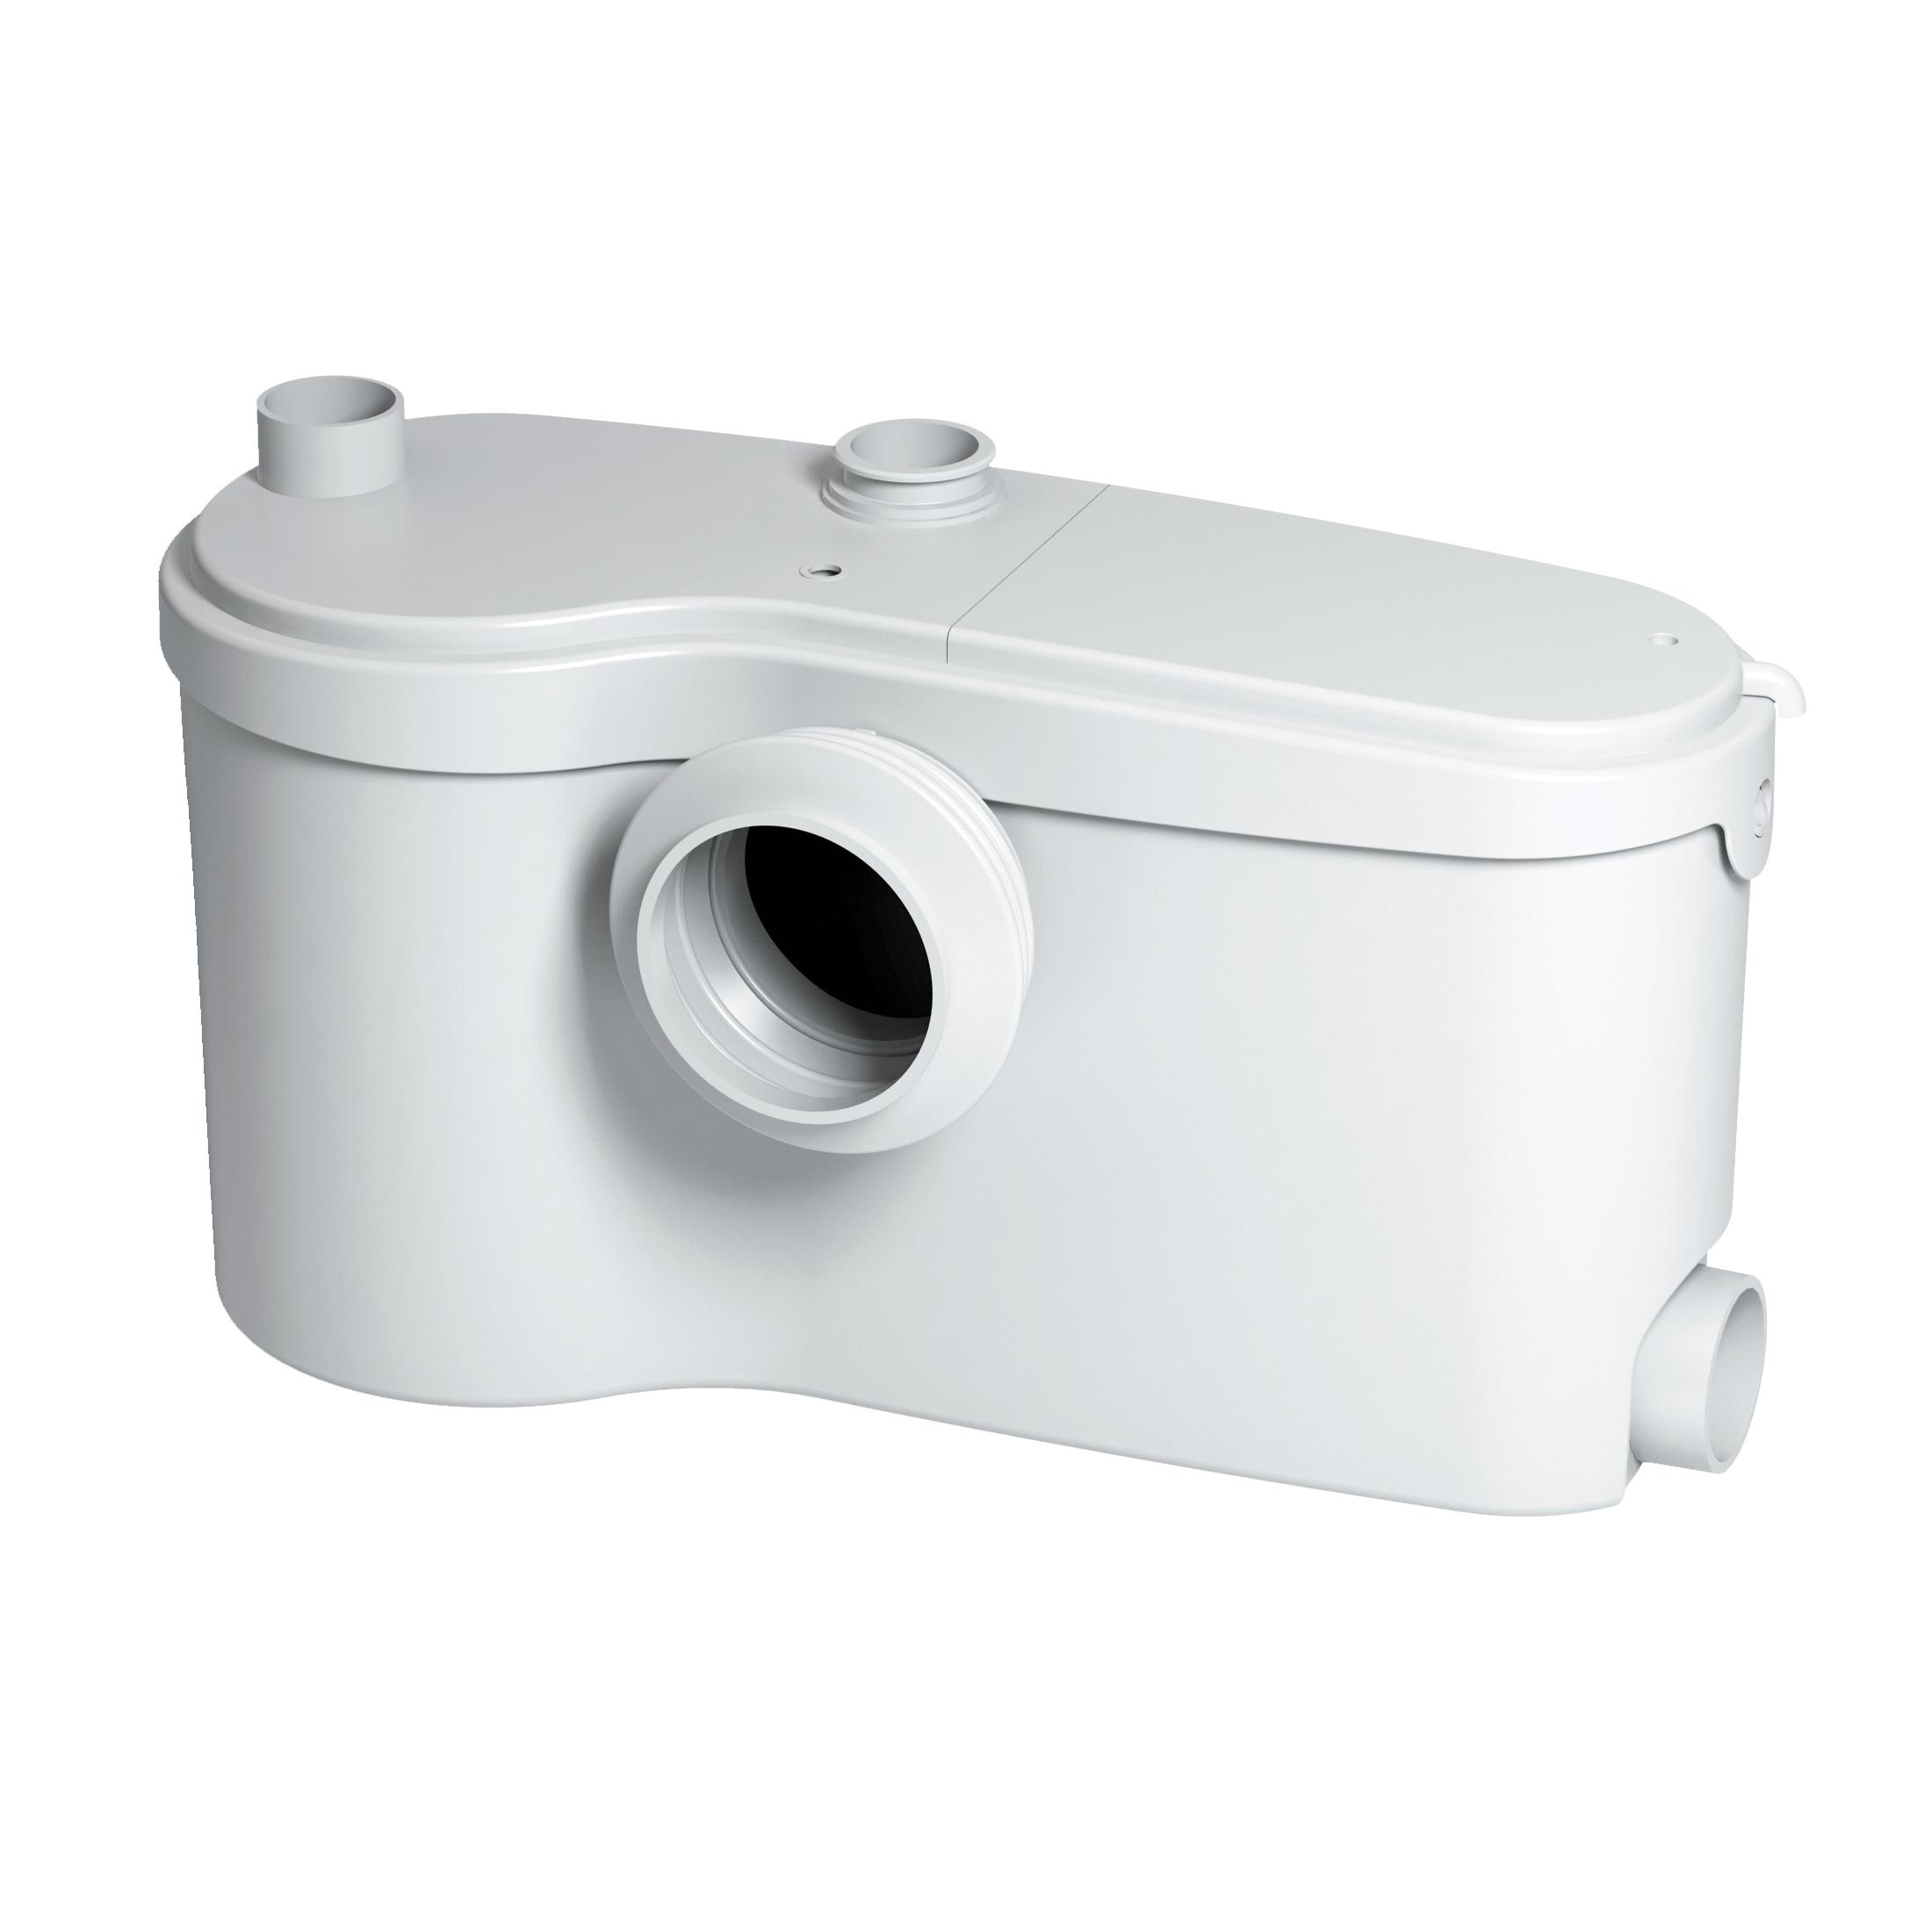 Saniflo® Sanibest® Pro 13 Grinder Pump Only, 115 VAC